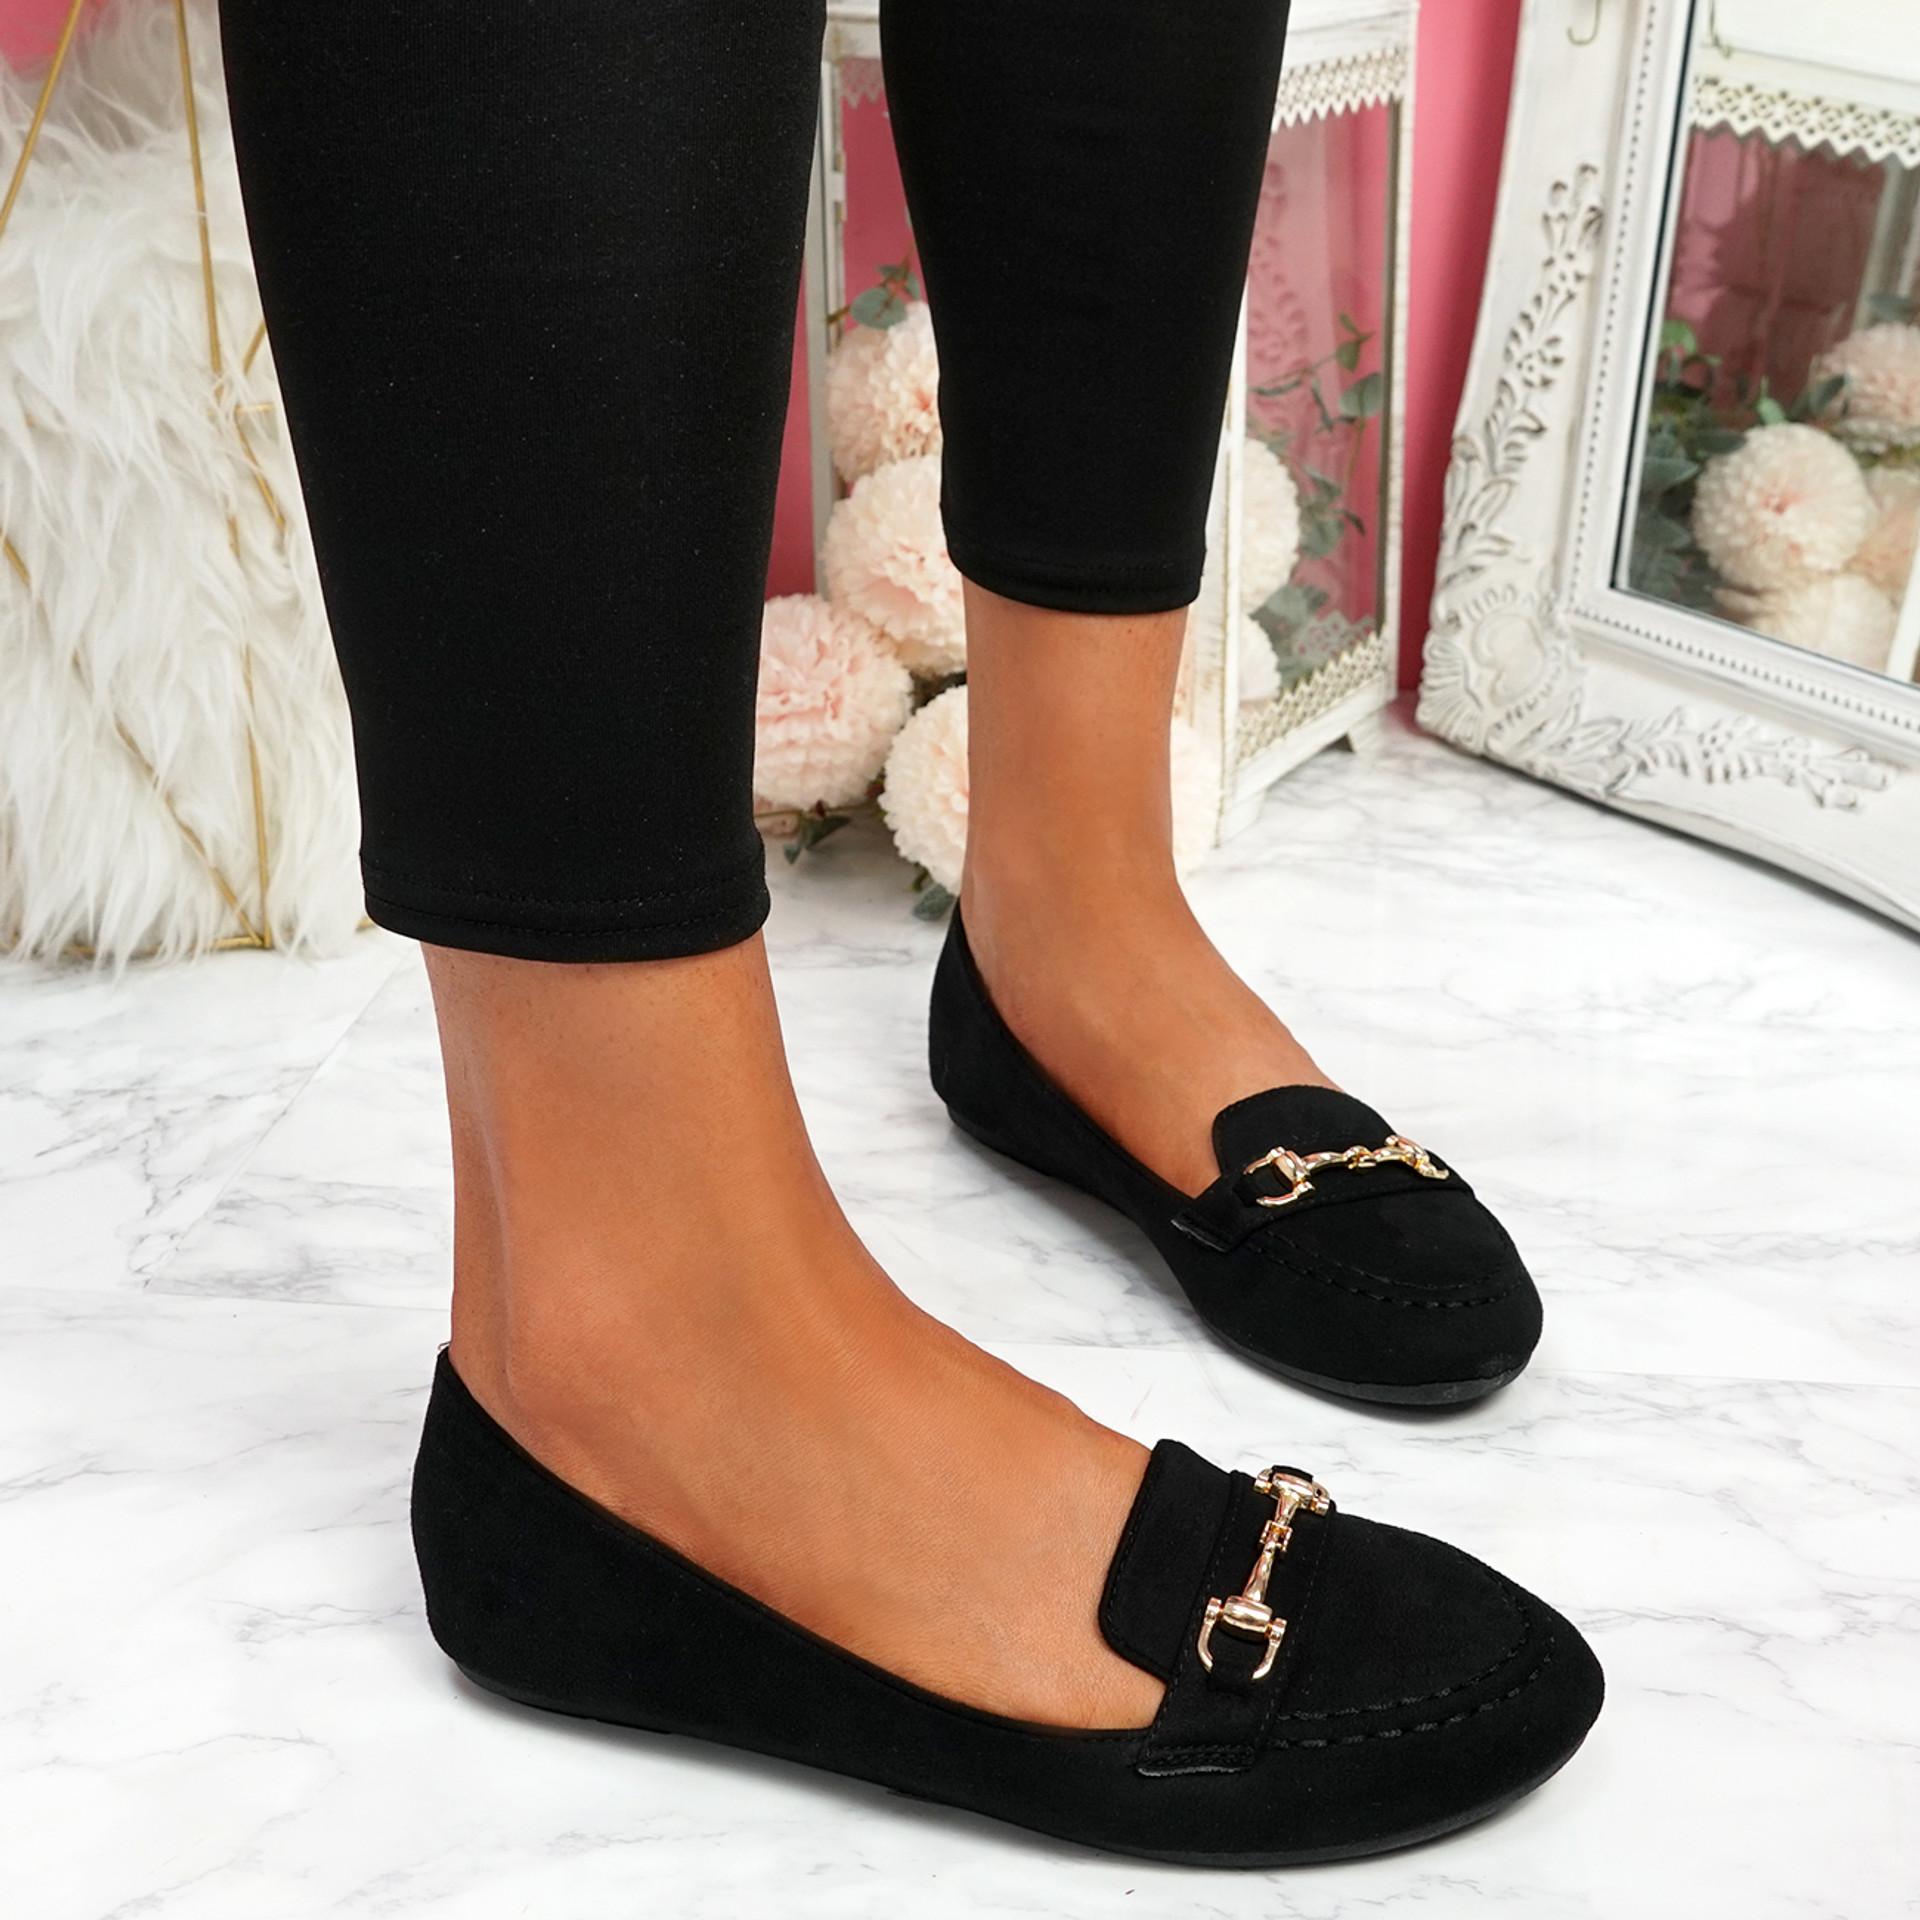 Mero Black Flat Ballerinas